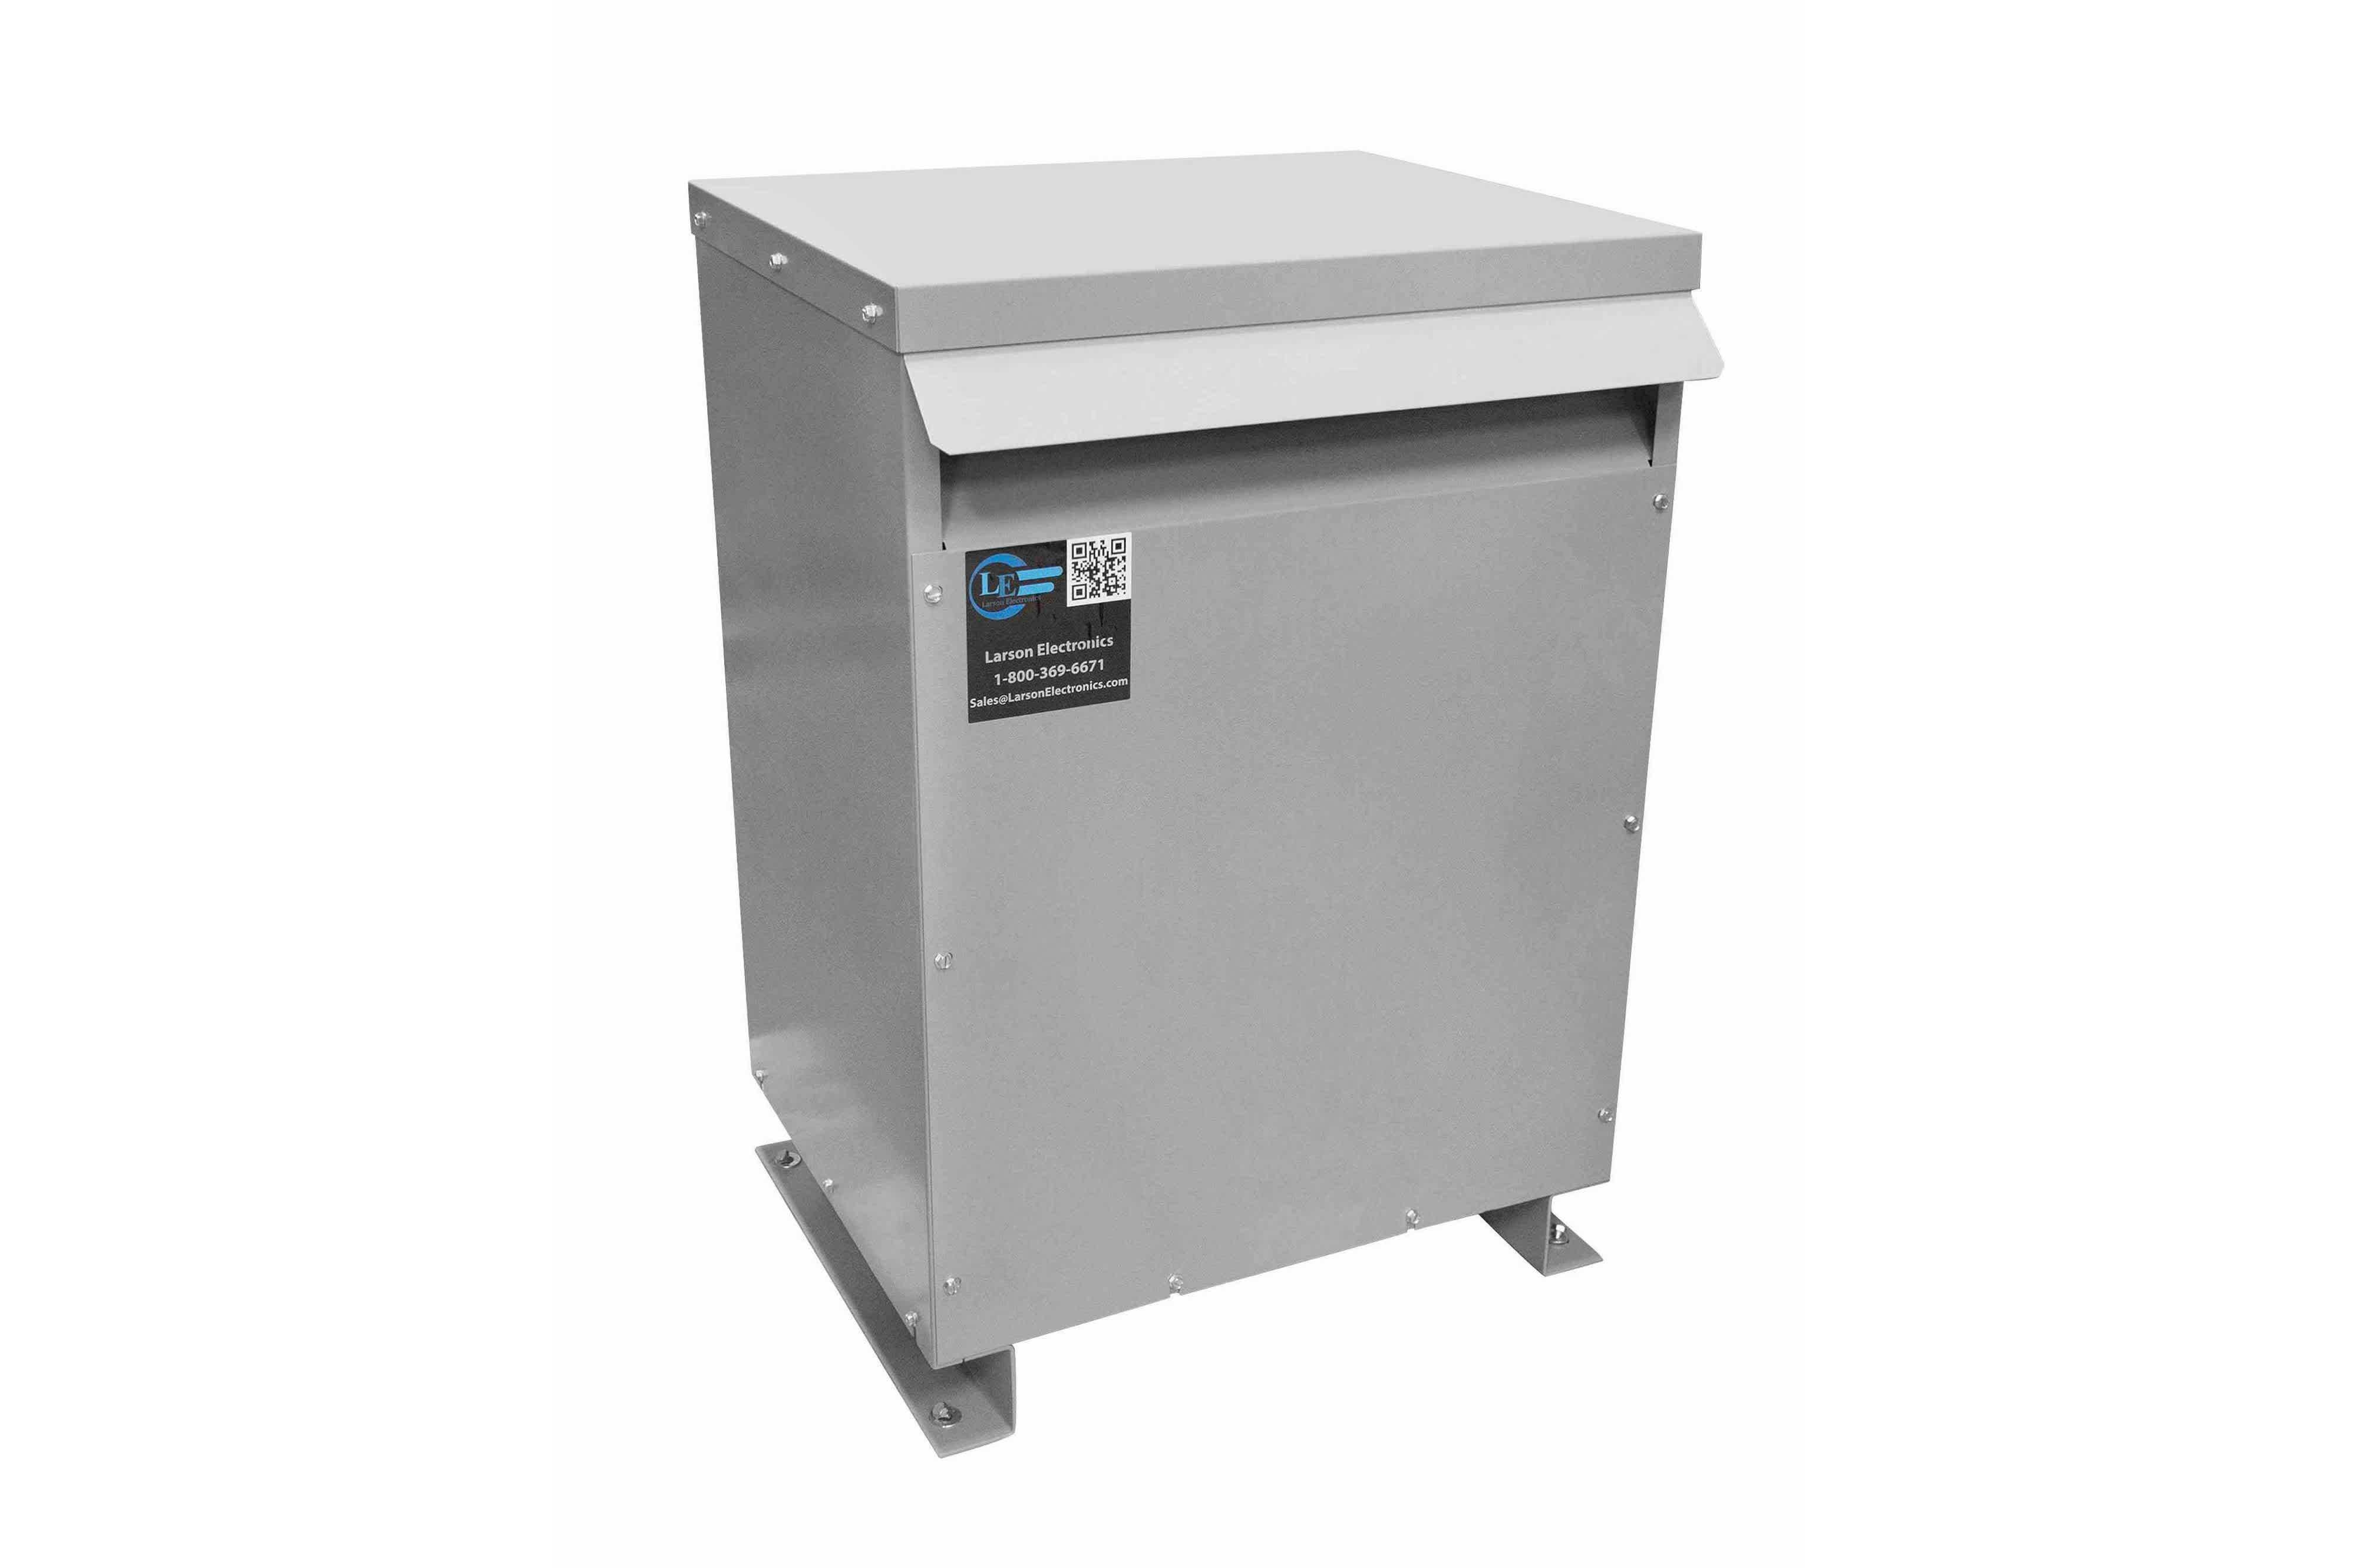 750 kVA 3PH DOE Transformer, 208V Delta Primary, 600Y/347 Wye-N Secondary, N3R, Ventilated, 60 Hz